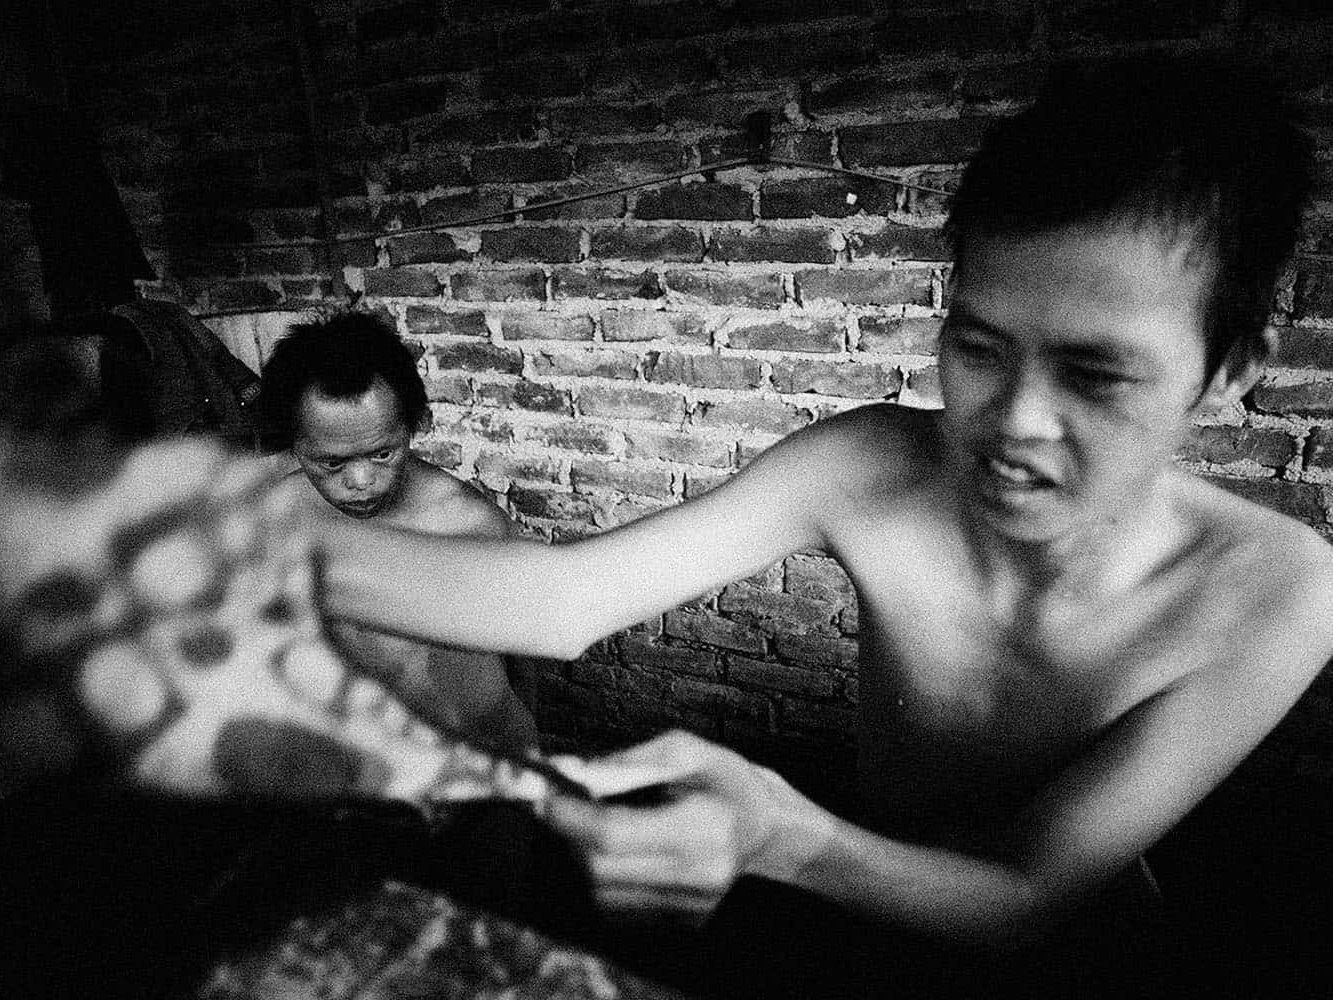 vietnam photographer smallthings binhdang 4